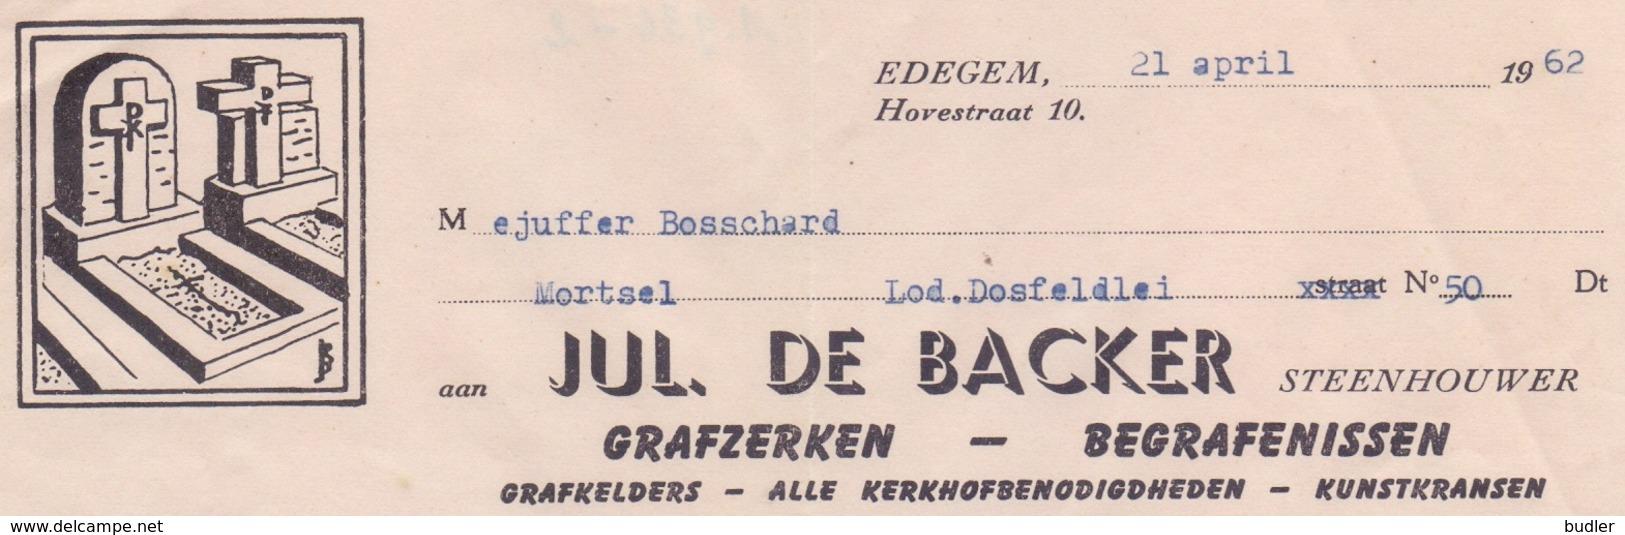 1962: Factuur Van ## Jul. DE BACKER, Hovestraat, 10, EDEGEM ## Aan ##Mvr. Wed. BOSSHARD, Lod. Dosfeldlei, 50, MORTSEL## - 1950 - ...